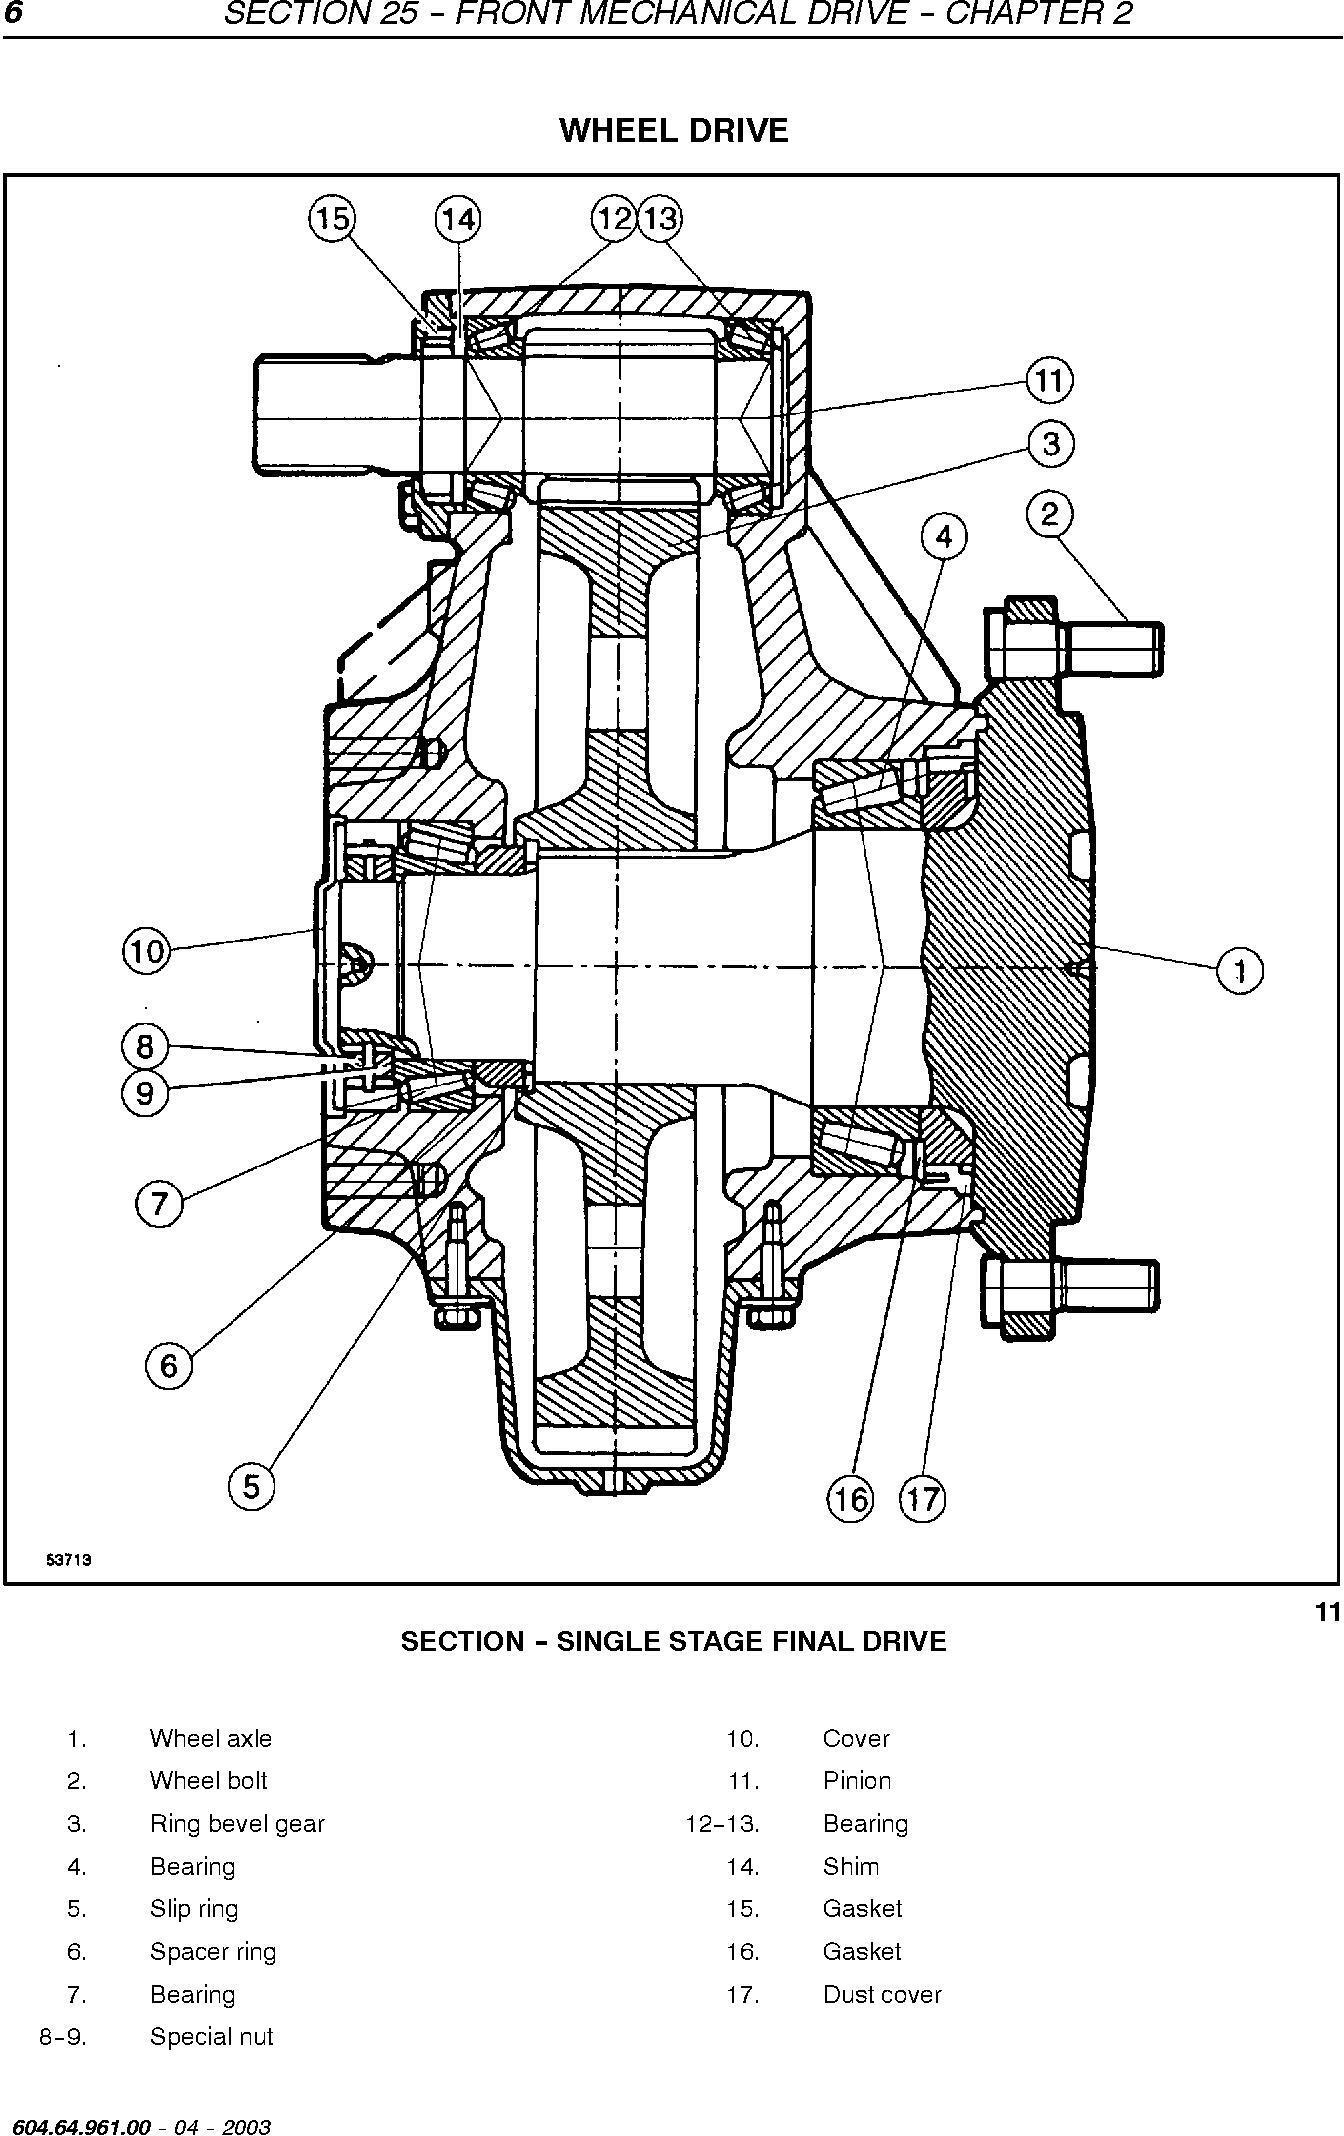 New Holland TC54, TC56, AL59 Utility Combine Service Manual - 2